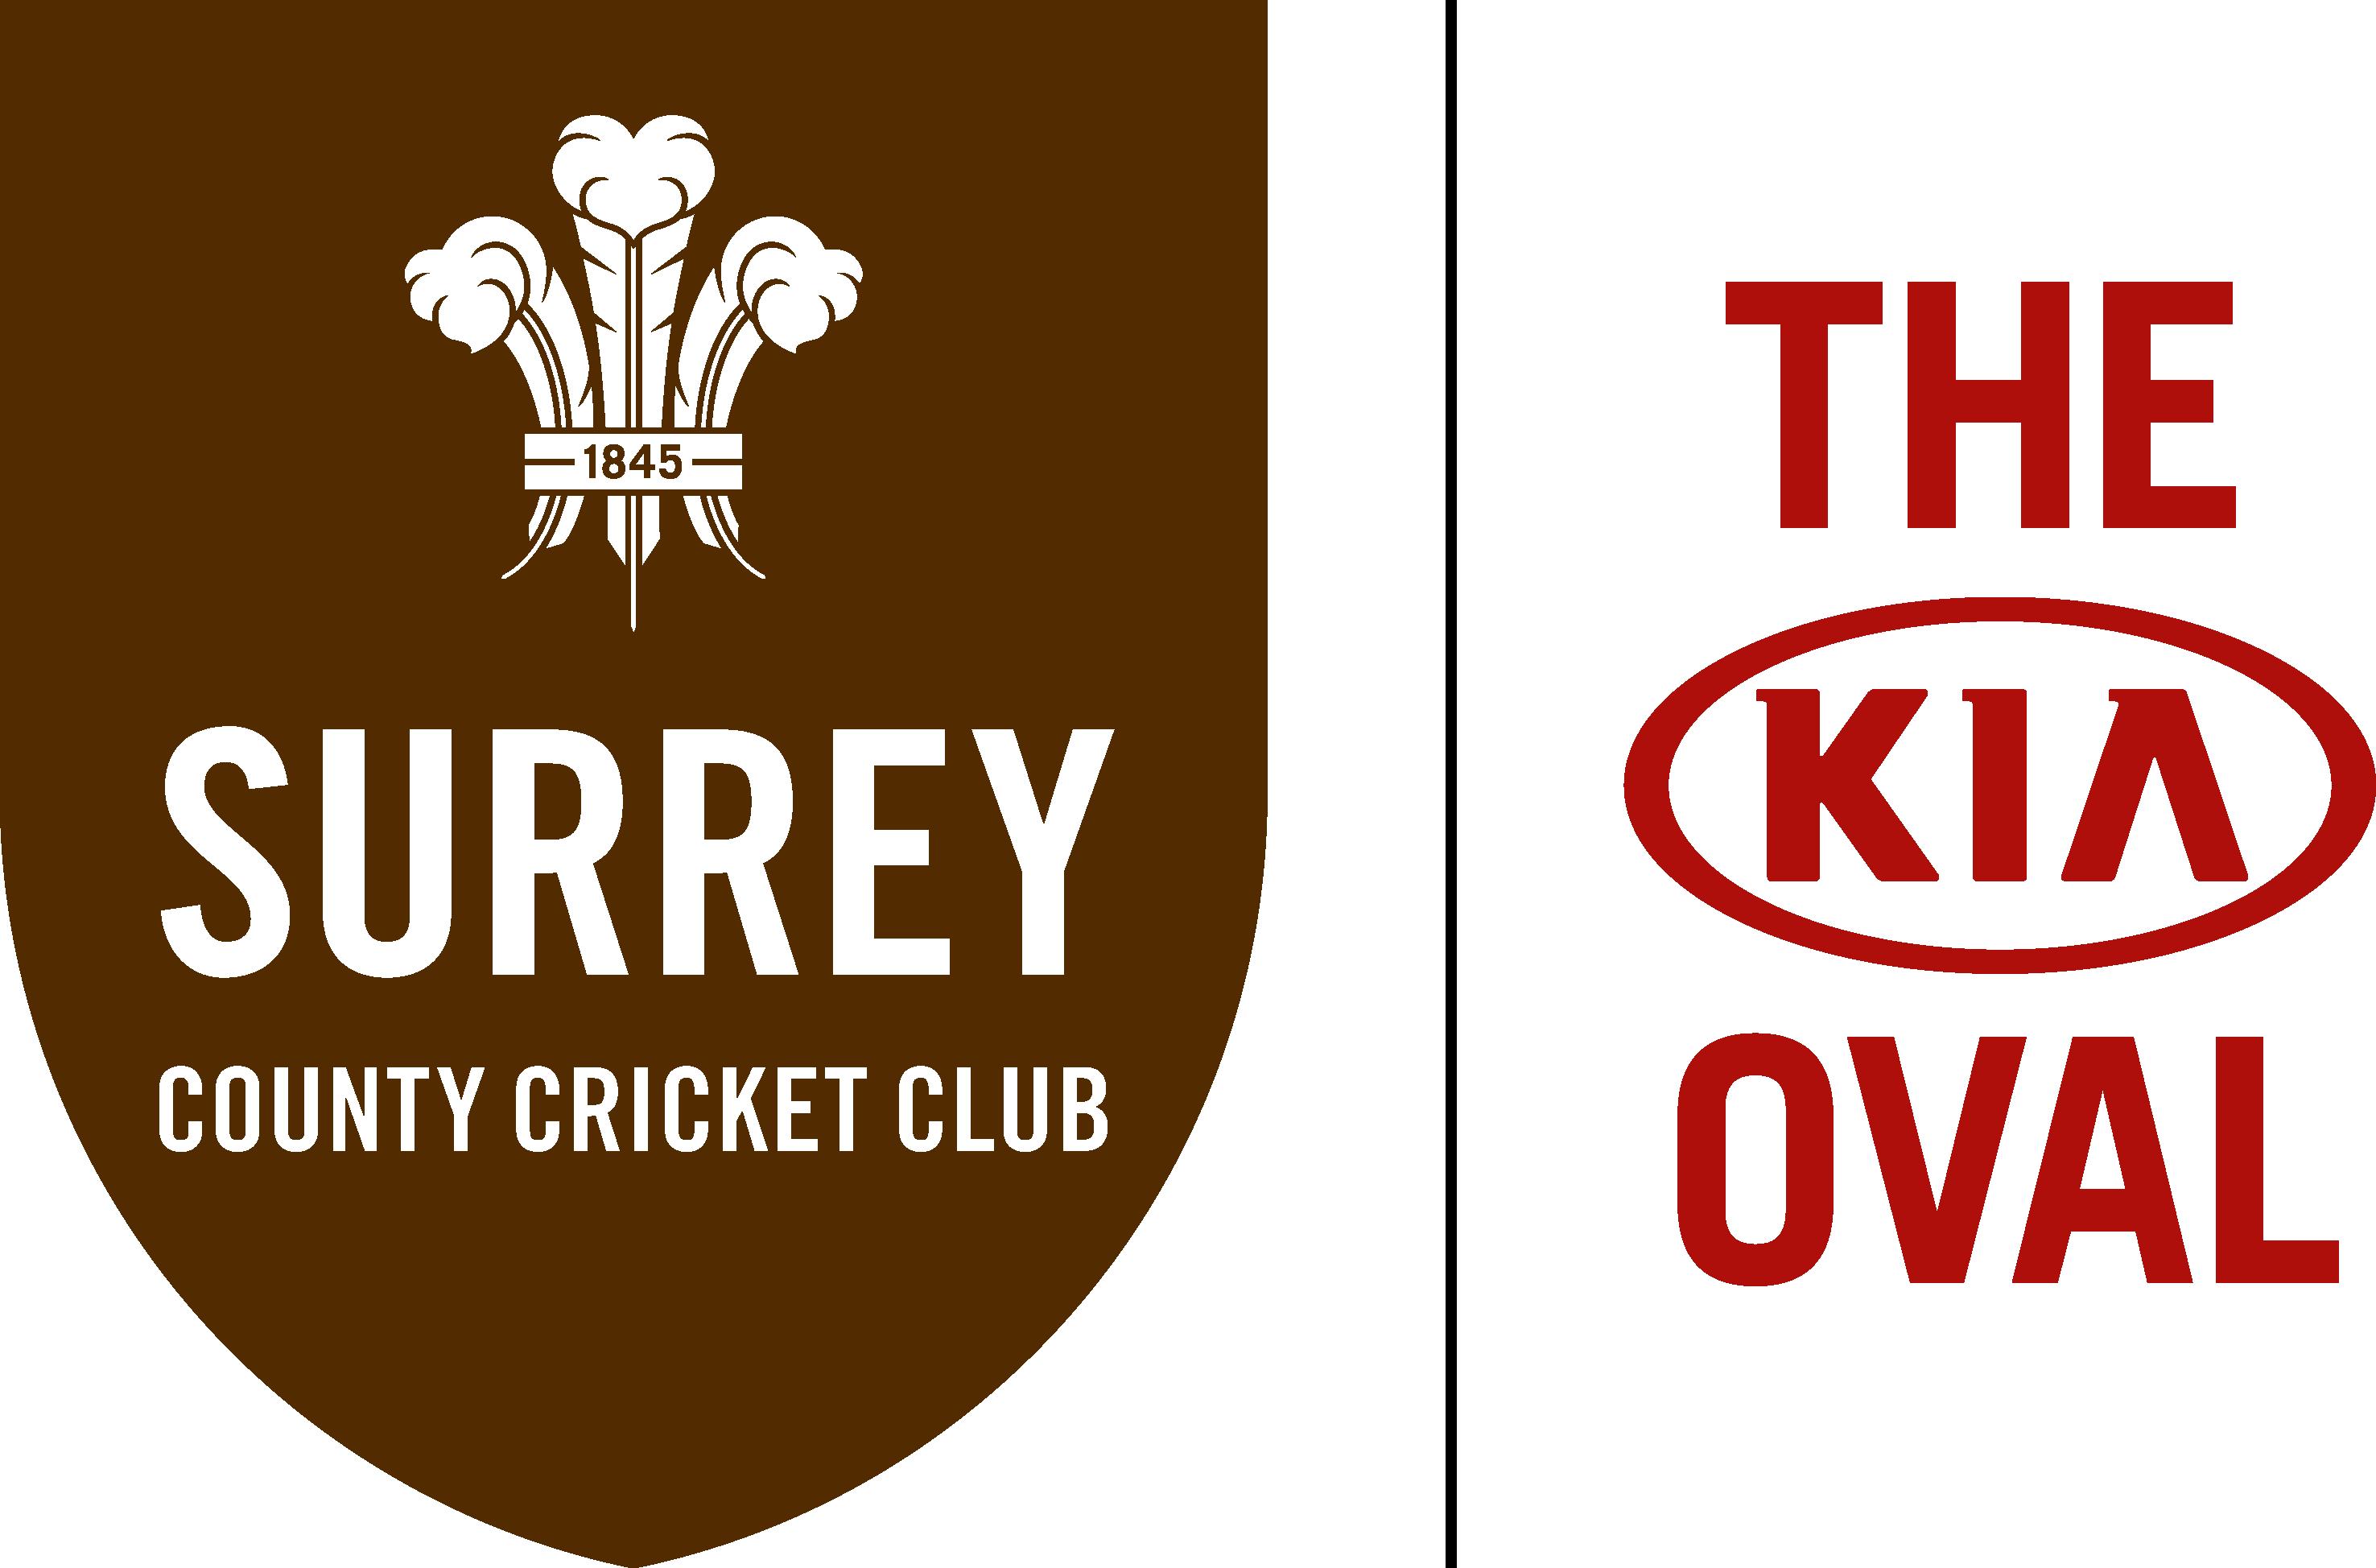 Surrey CCC - Kia Oval